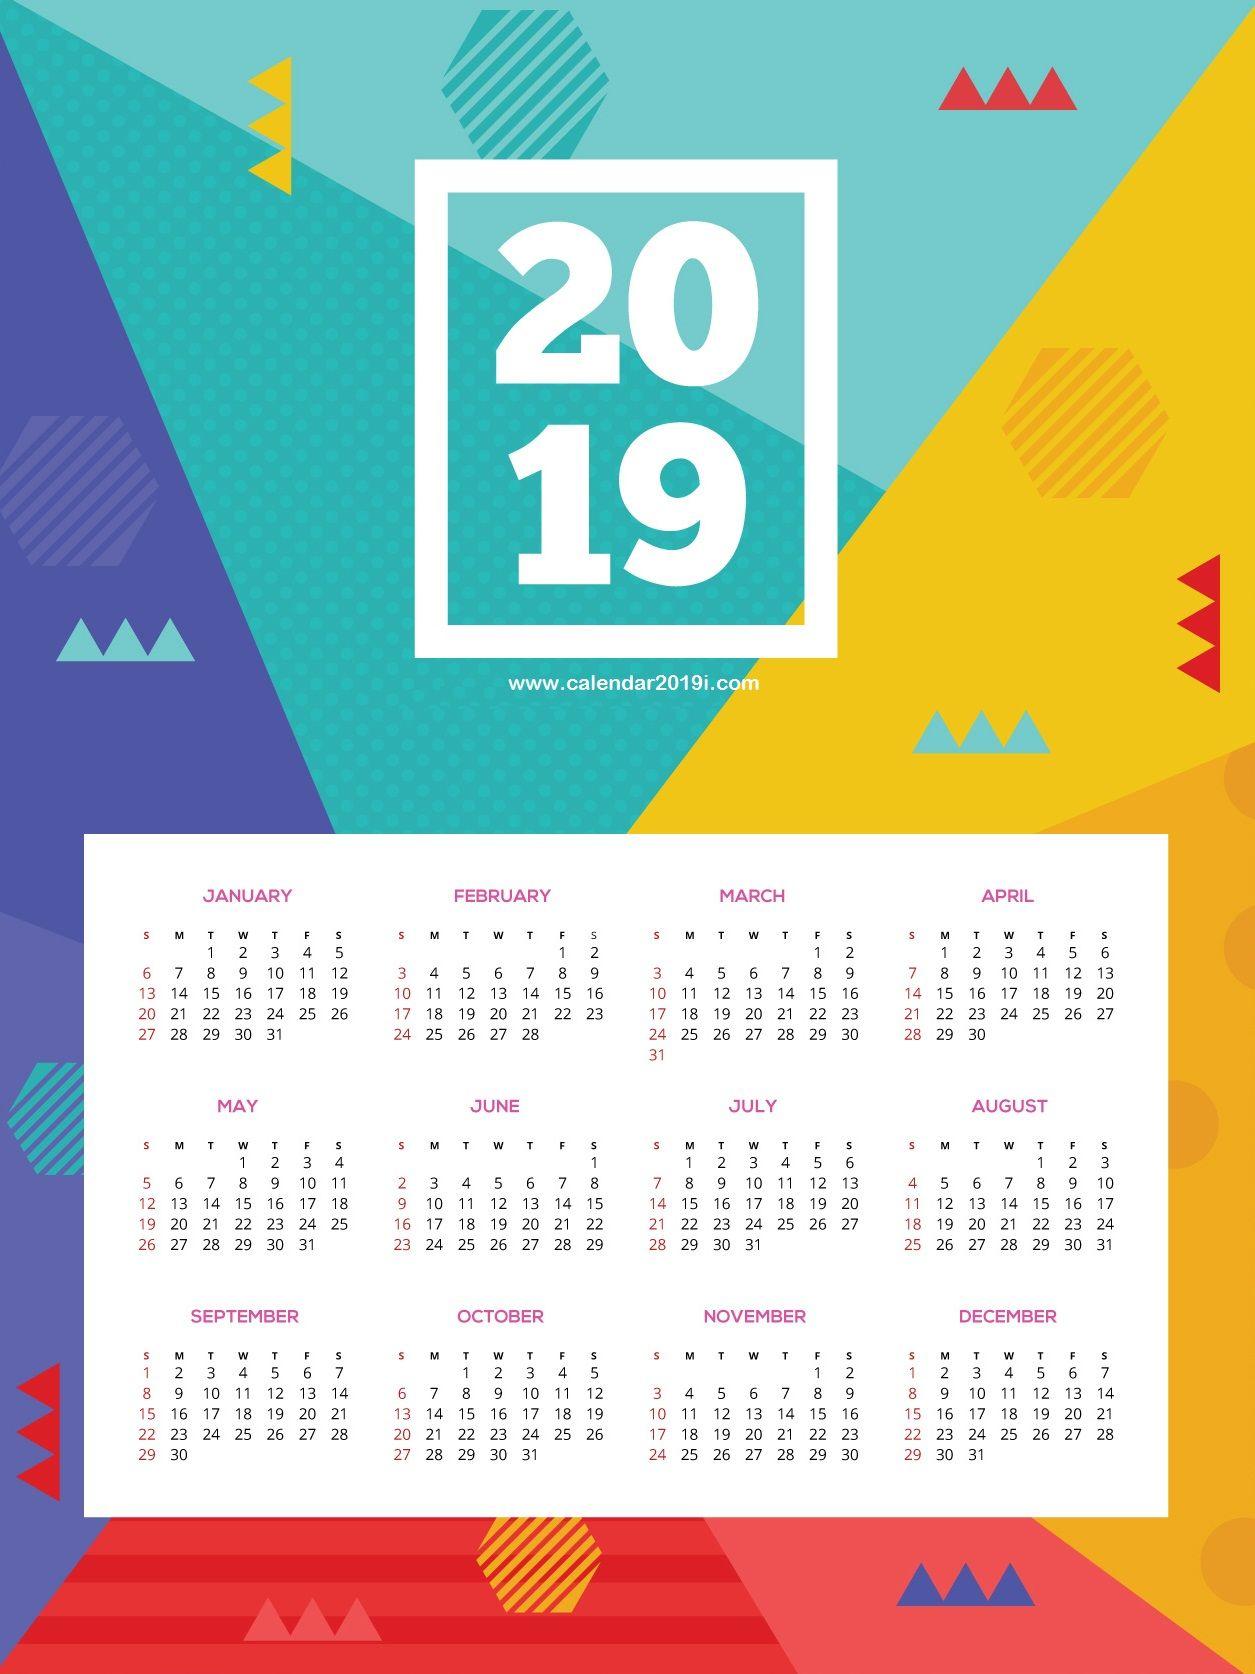 Calendar 2014 And 2019 Printable Printable 2019 HD Wall Calendar | Monthly Calendar Templates